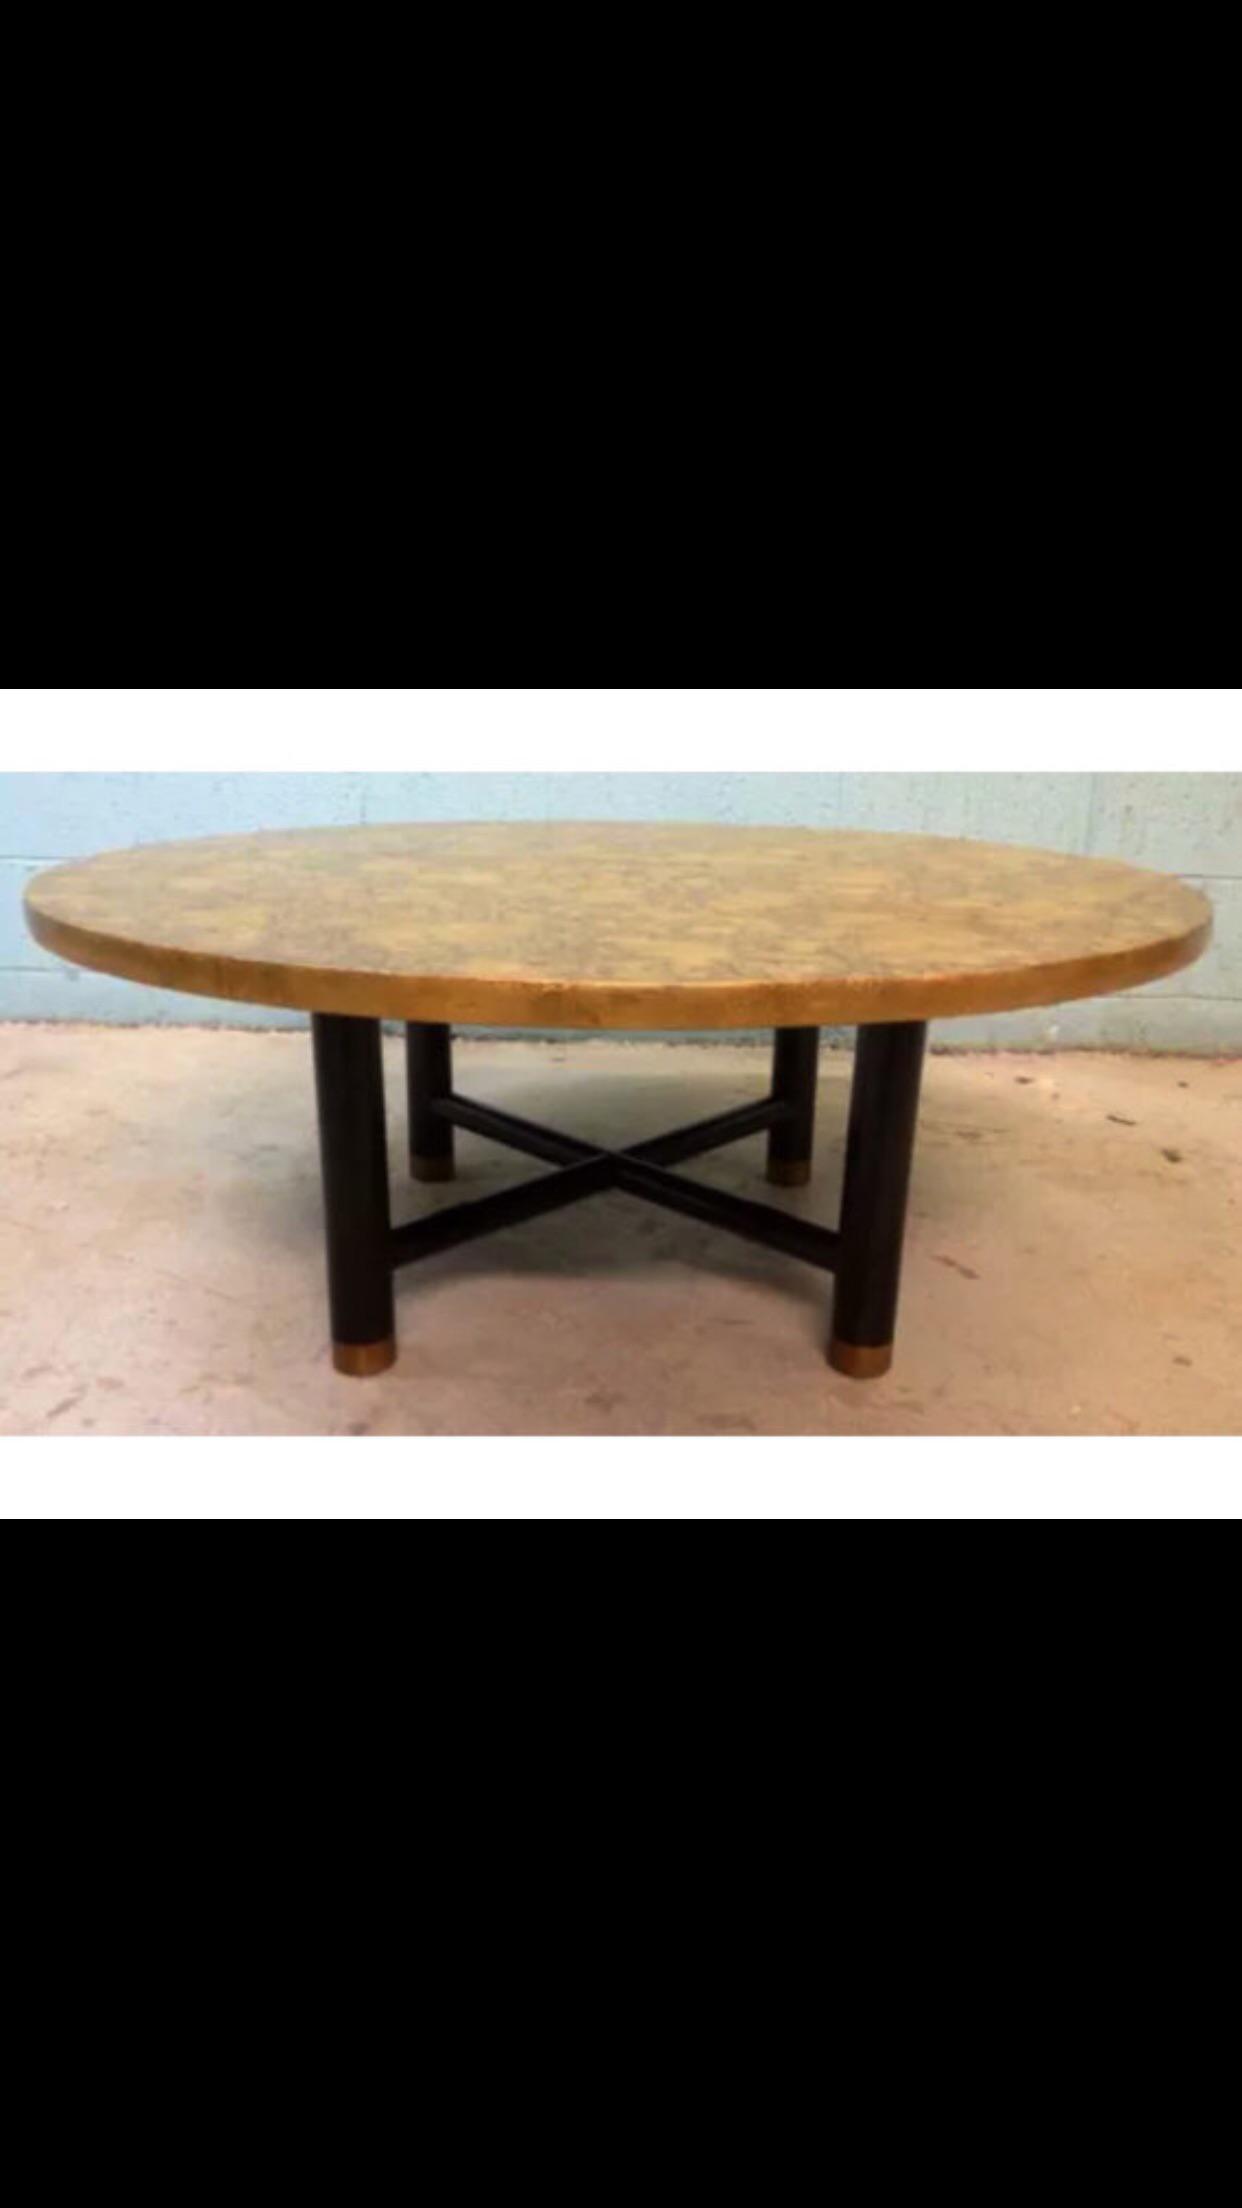 Vintage Henredon Black U0026 Gold Coffee Table   Image 2 ...